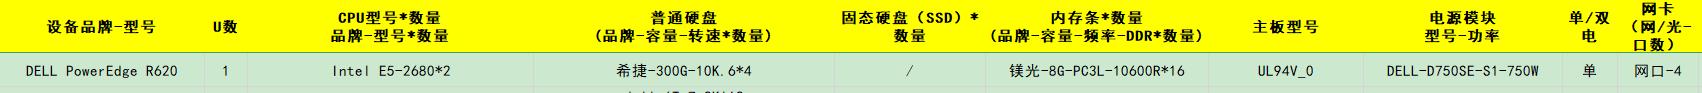 DELL PowerEdge R620 Intel E5-2680*2 希捷-300G-10K.6*4 镁光-8G-PC3L-10600R*16